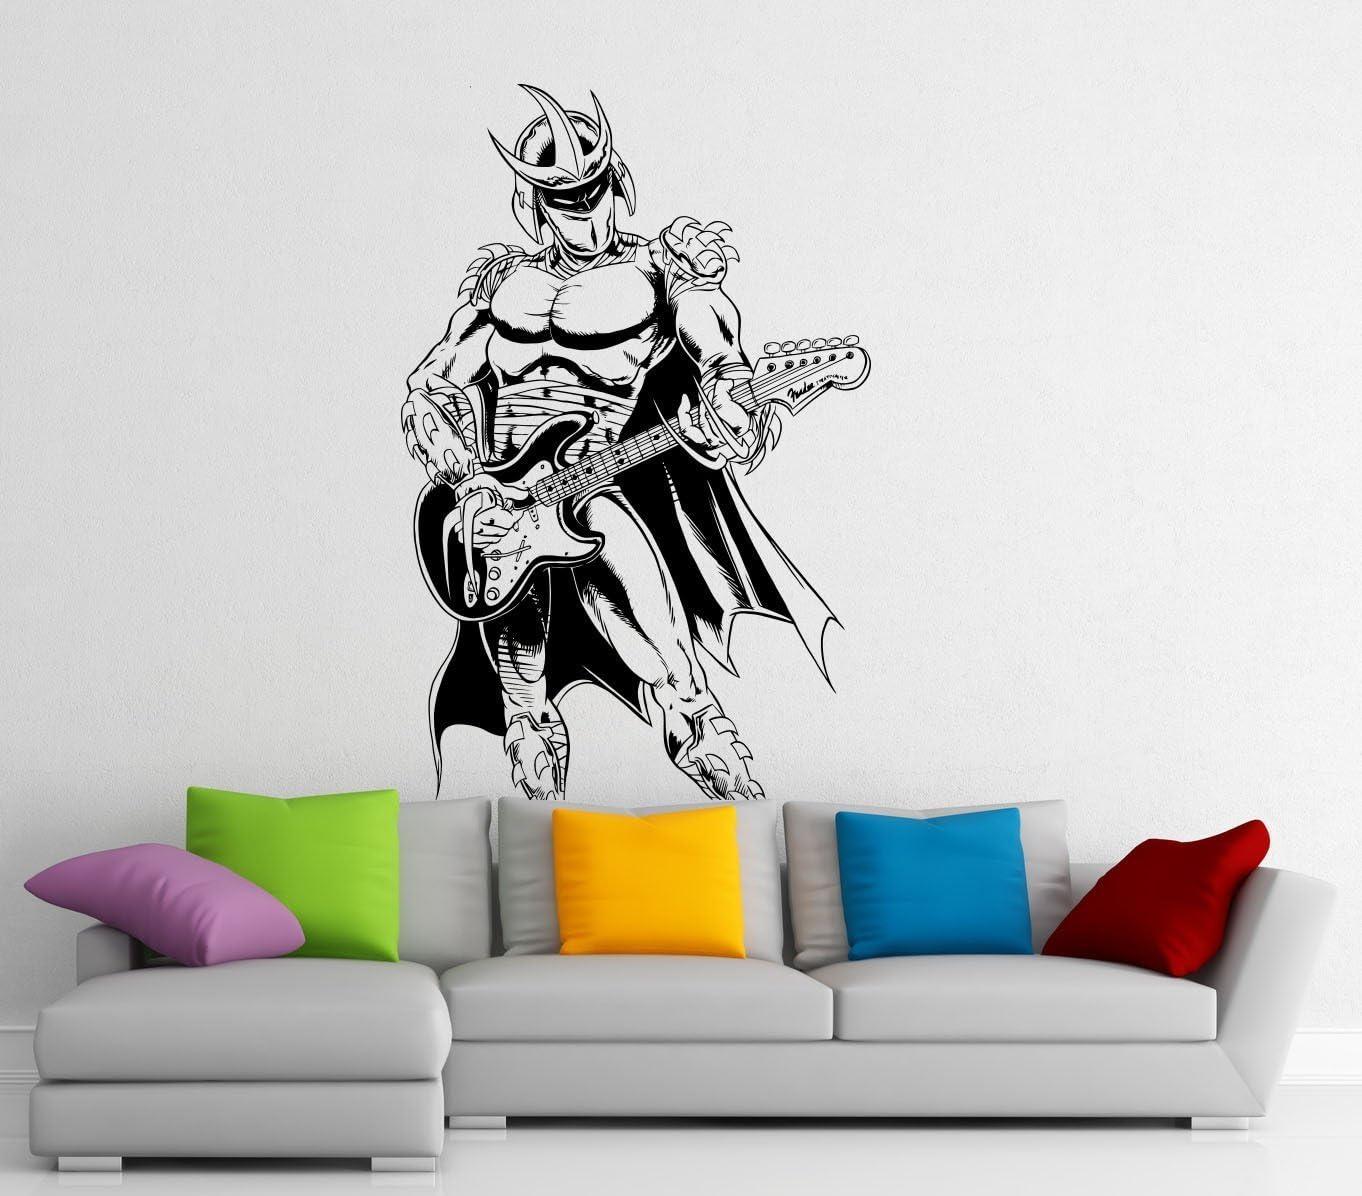 AdecalsNew Shredder TMNT Wall Decal Oroku Saki Vinyl Sticker Superhero Comic Book Home Interior Children Room Wall Decor (2s01r)